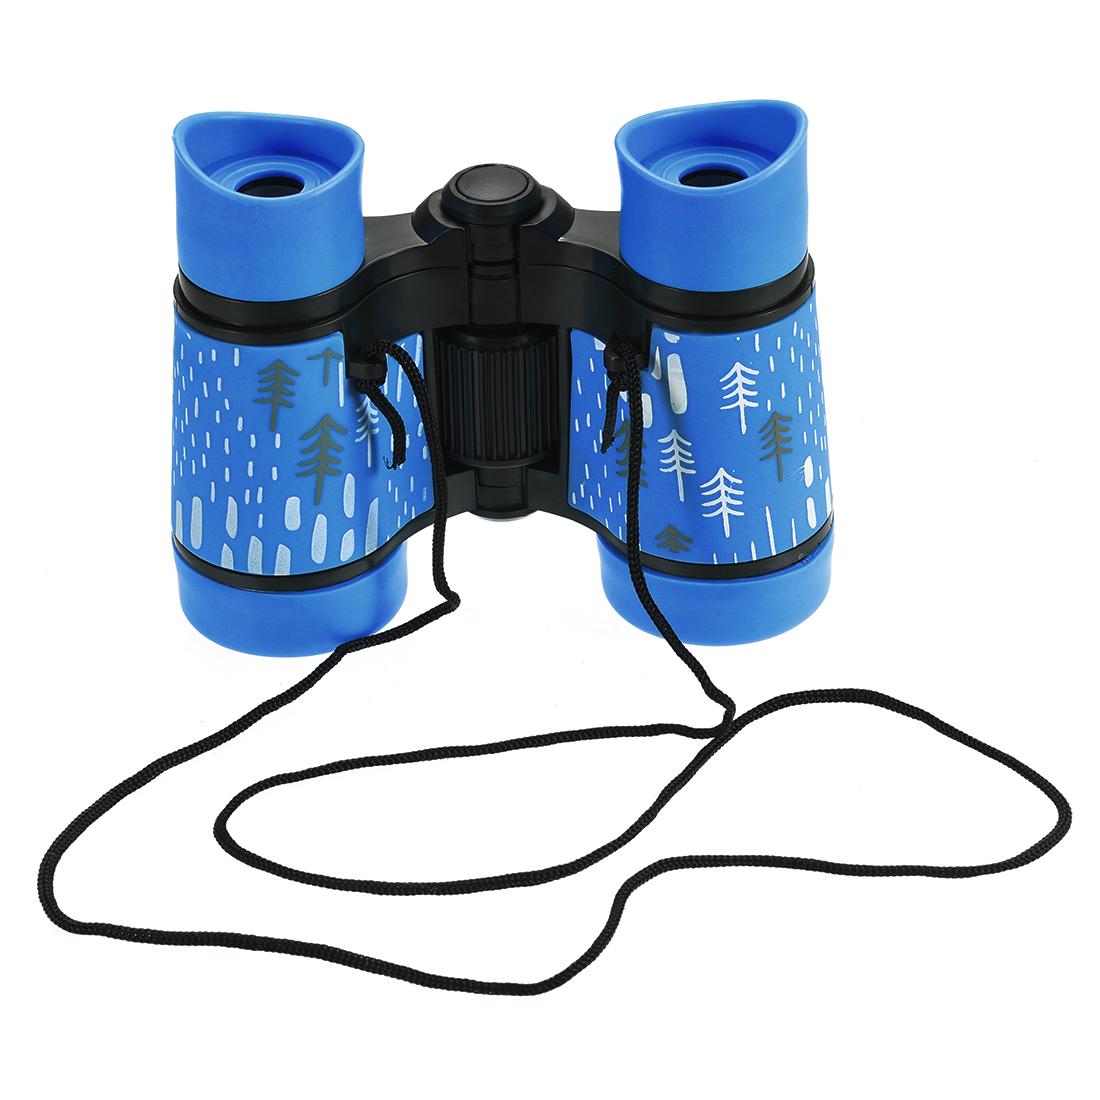 Toy Binoculars 4X30 Compact Folding Binoculars Sky Blue with Neck Strap